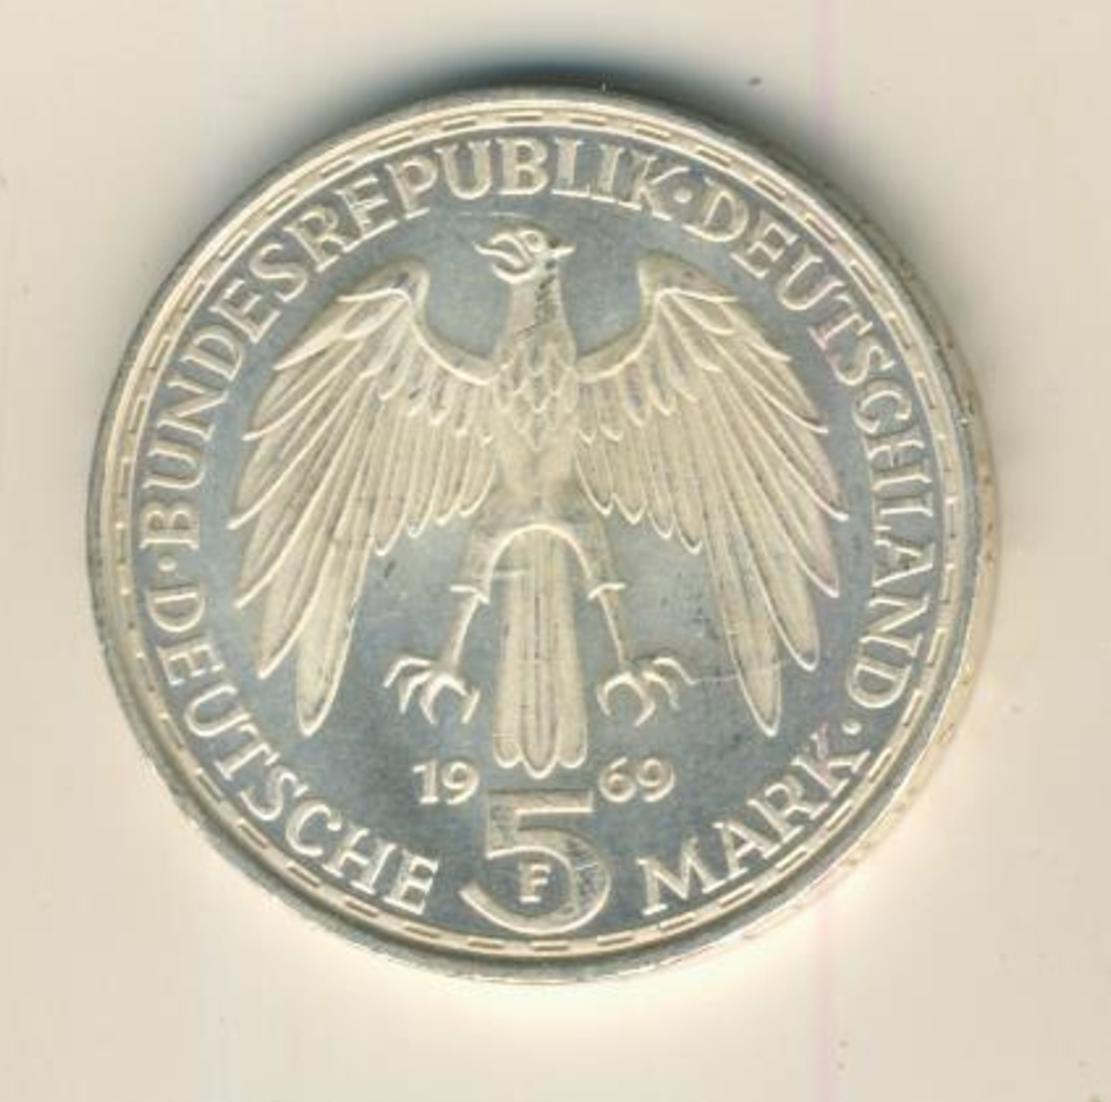 5 Mark DM 1969 F Gerhard Mercator, Silber   (12) 1